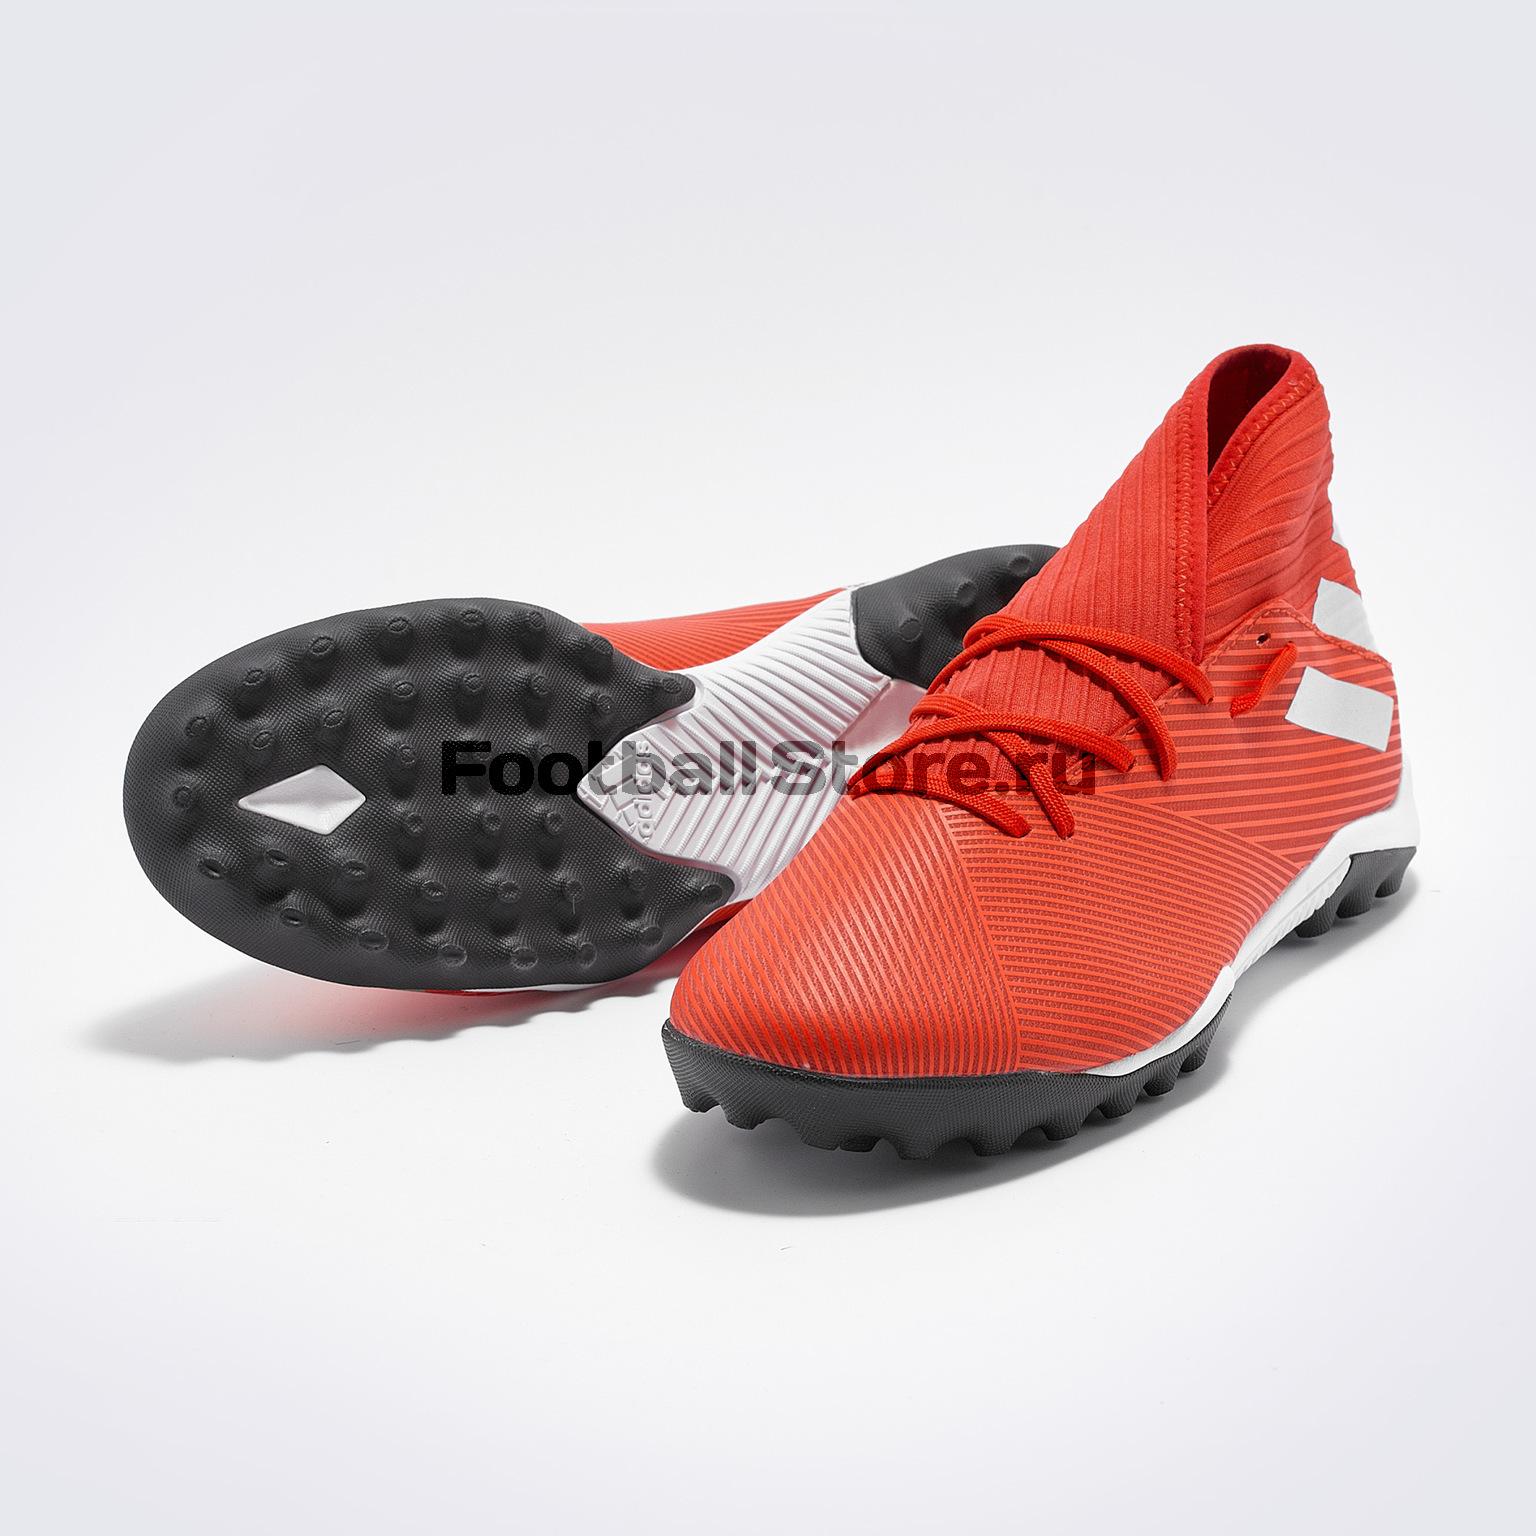 Шиповки Adidas Nemeziz 19.3 TF F34427 шиповки детские adidas x tango 18 3 tf db2422